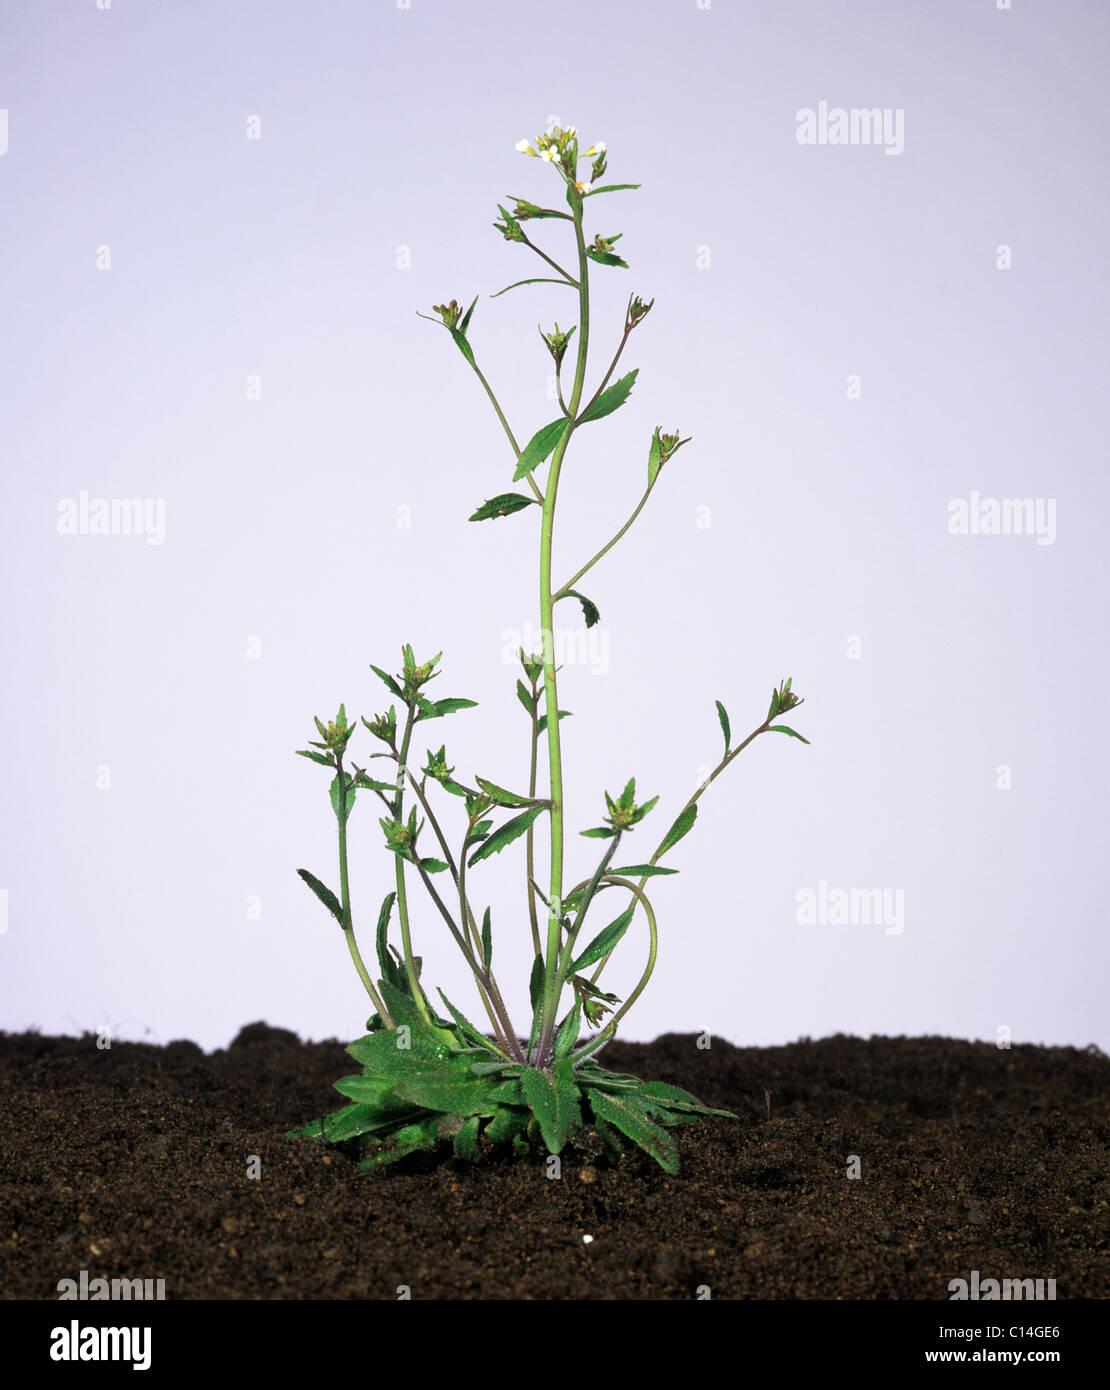 Thale cress (Arabidopsis thaliana) flowering plant - Stock Image